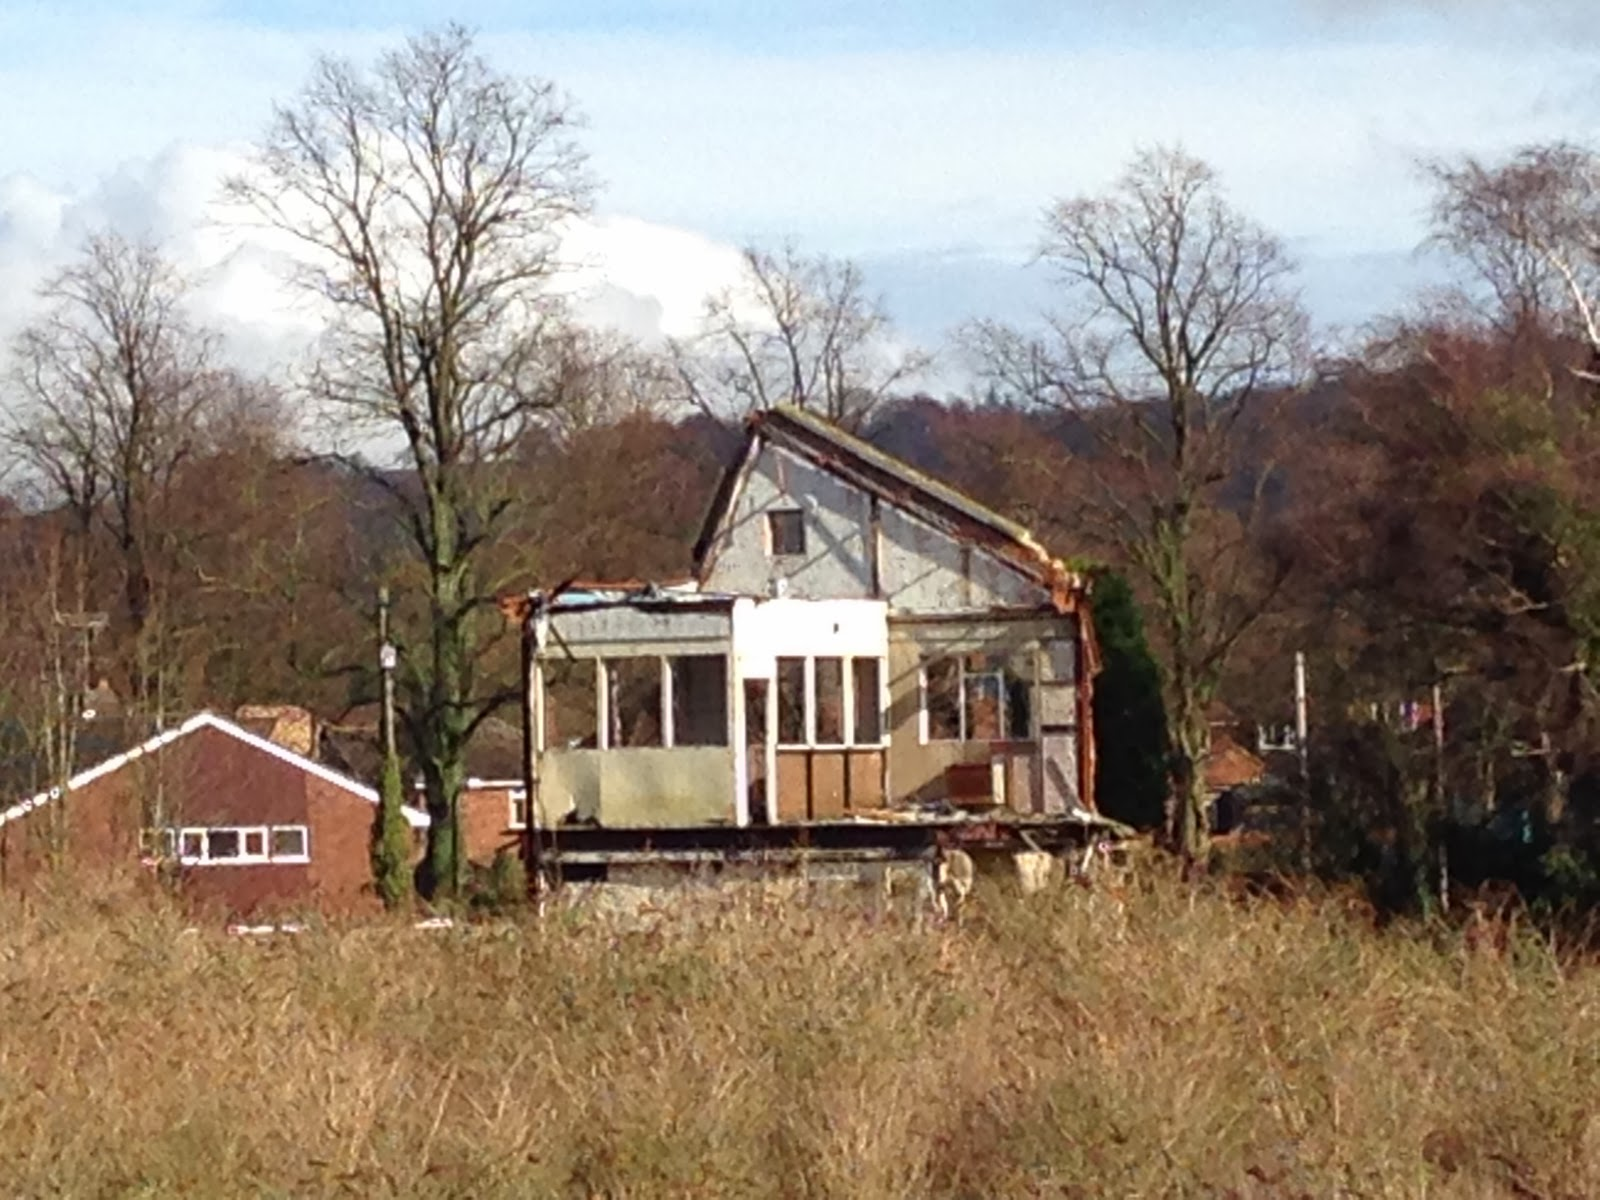 Demolition, near Princes Risborough station